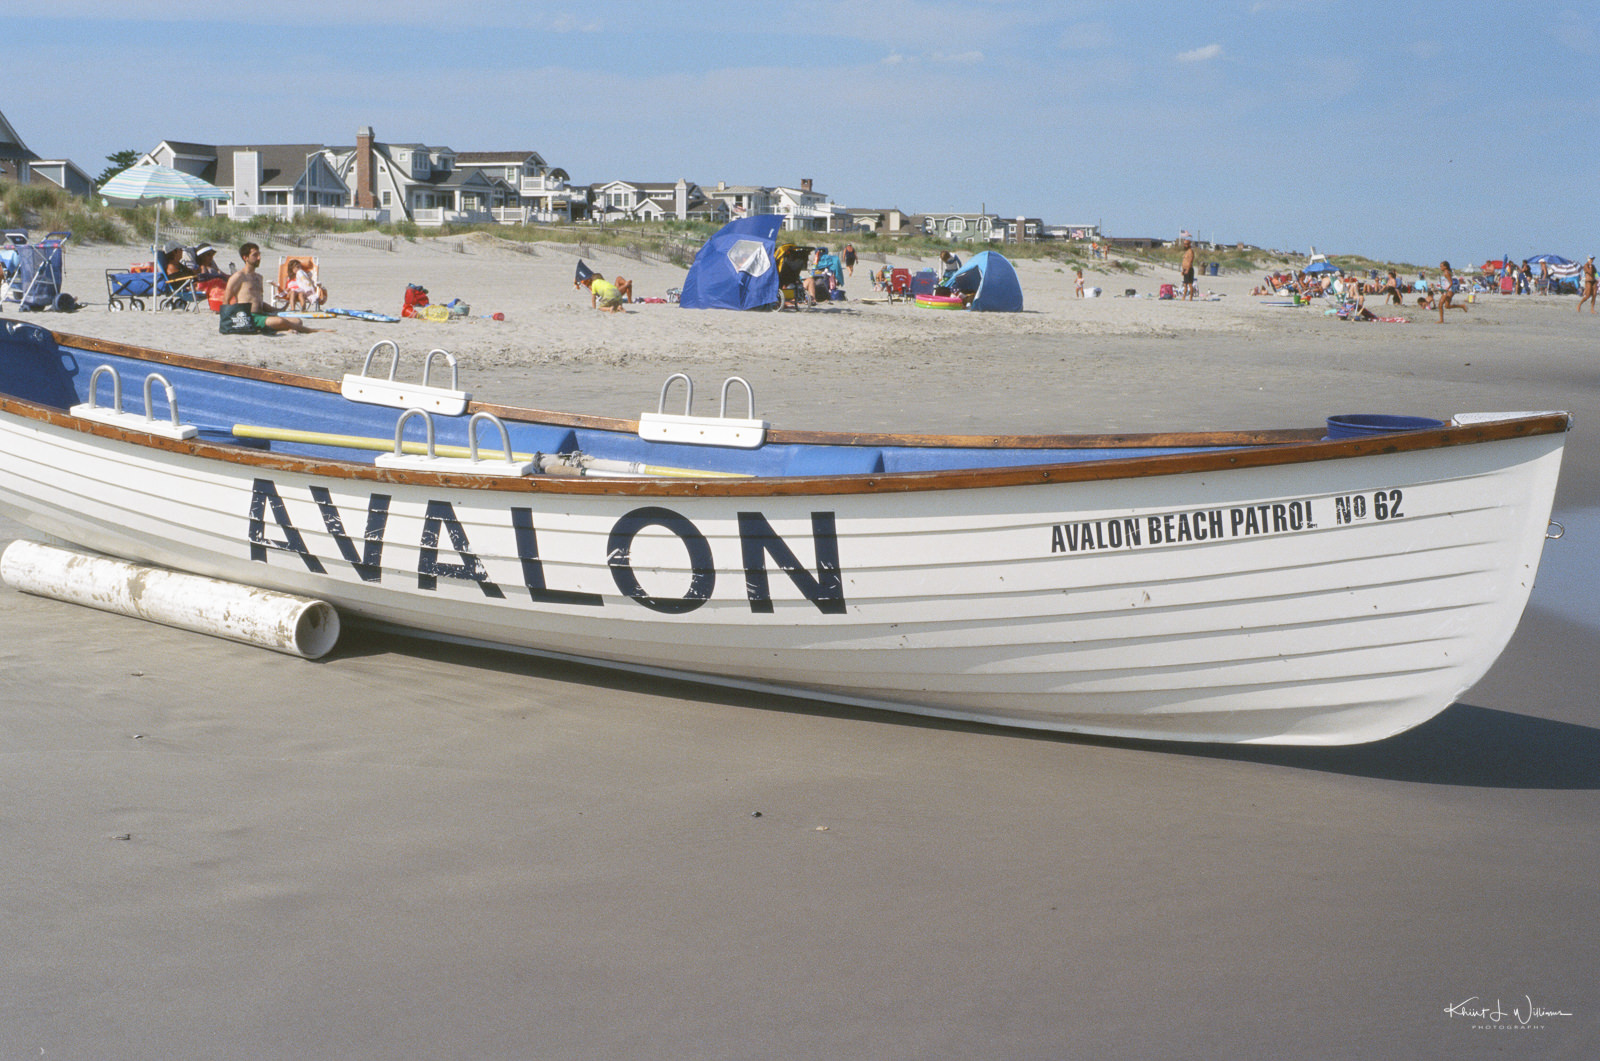 Avalon Beach Patrol #62, 7 Mile Island, Avalon, New Jersey. 26 August, 2020, Minolta X-700, Minolta MD Rokkor-X 50mm f/1.7